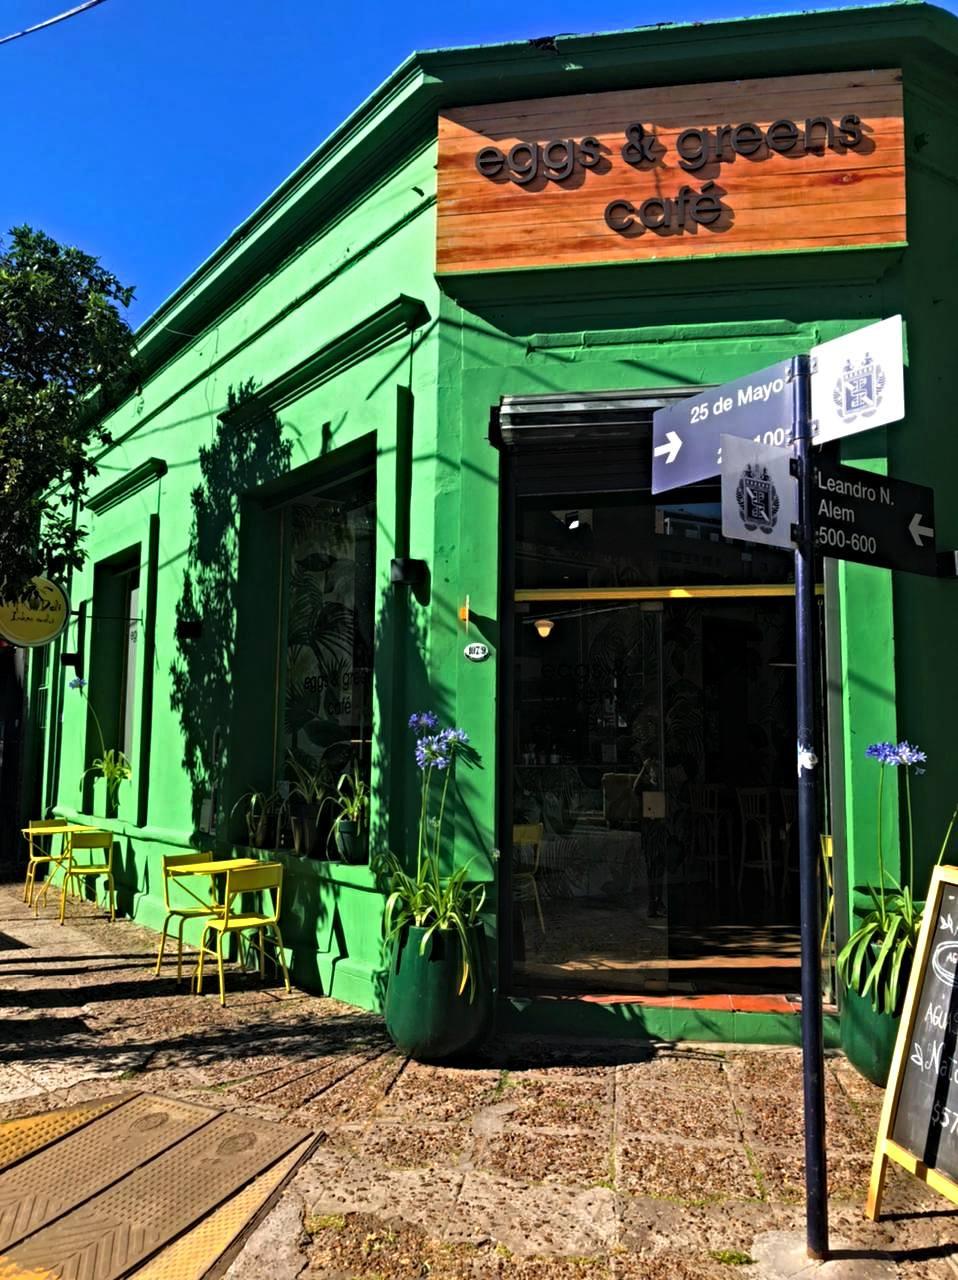 eggs & green cafe